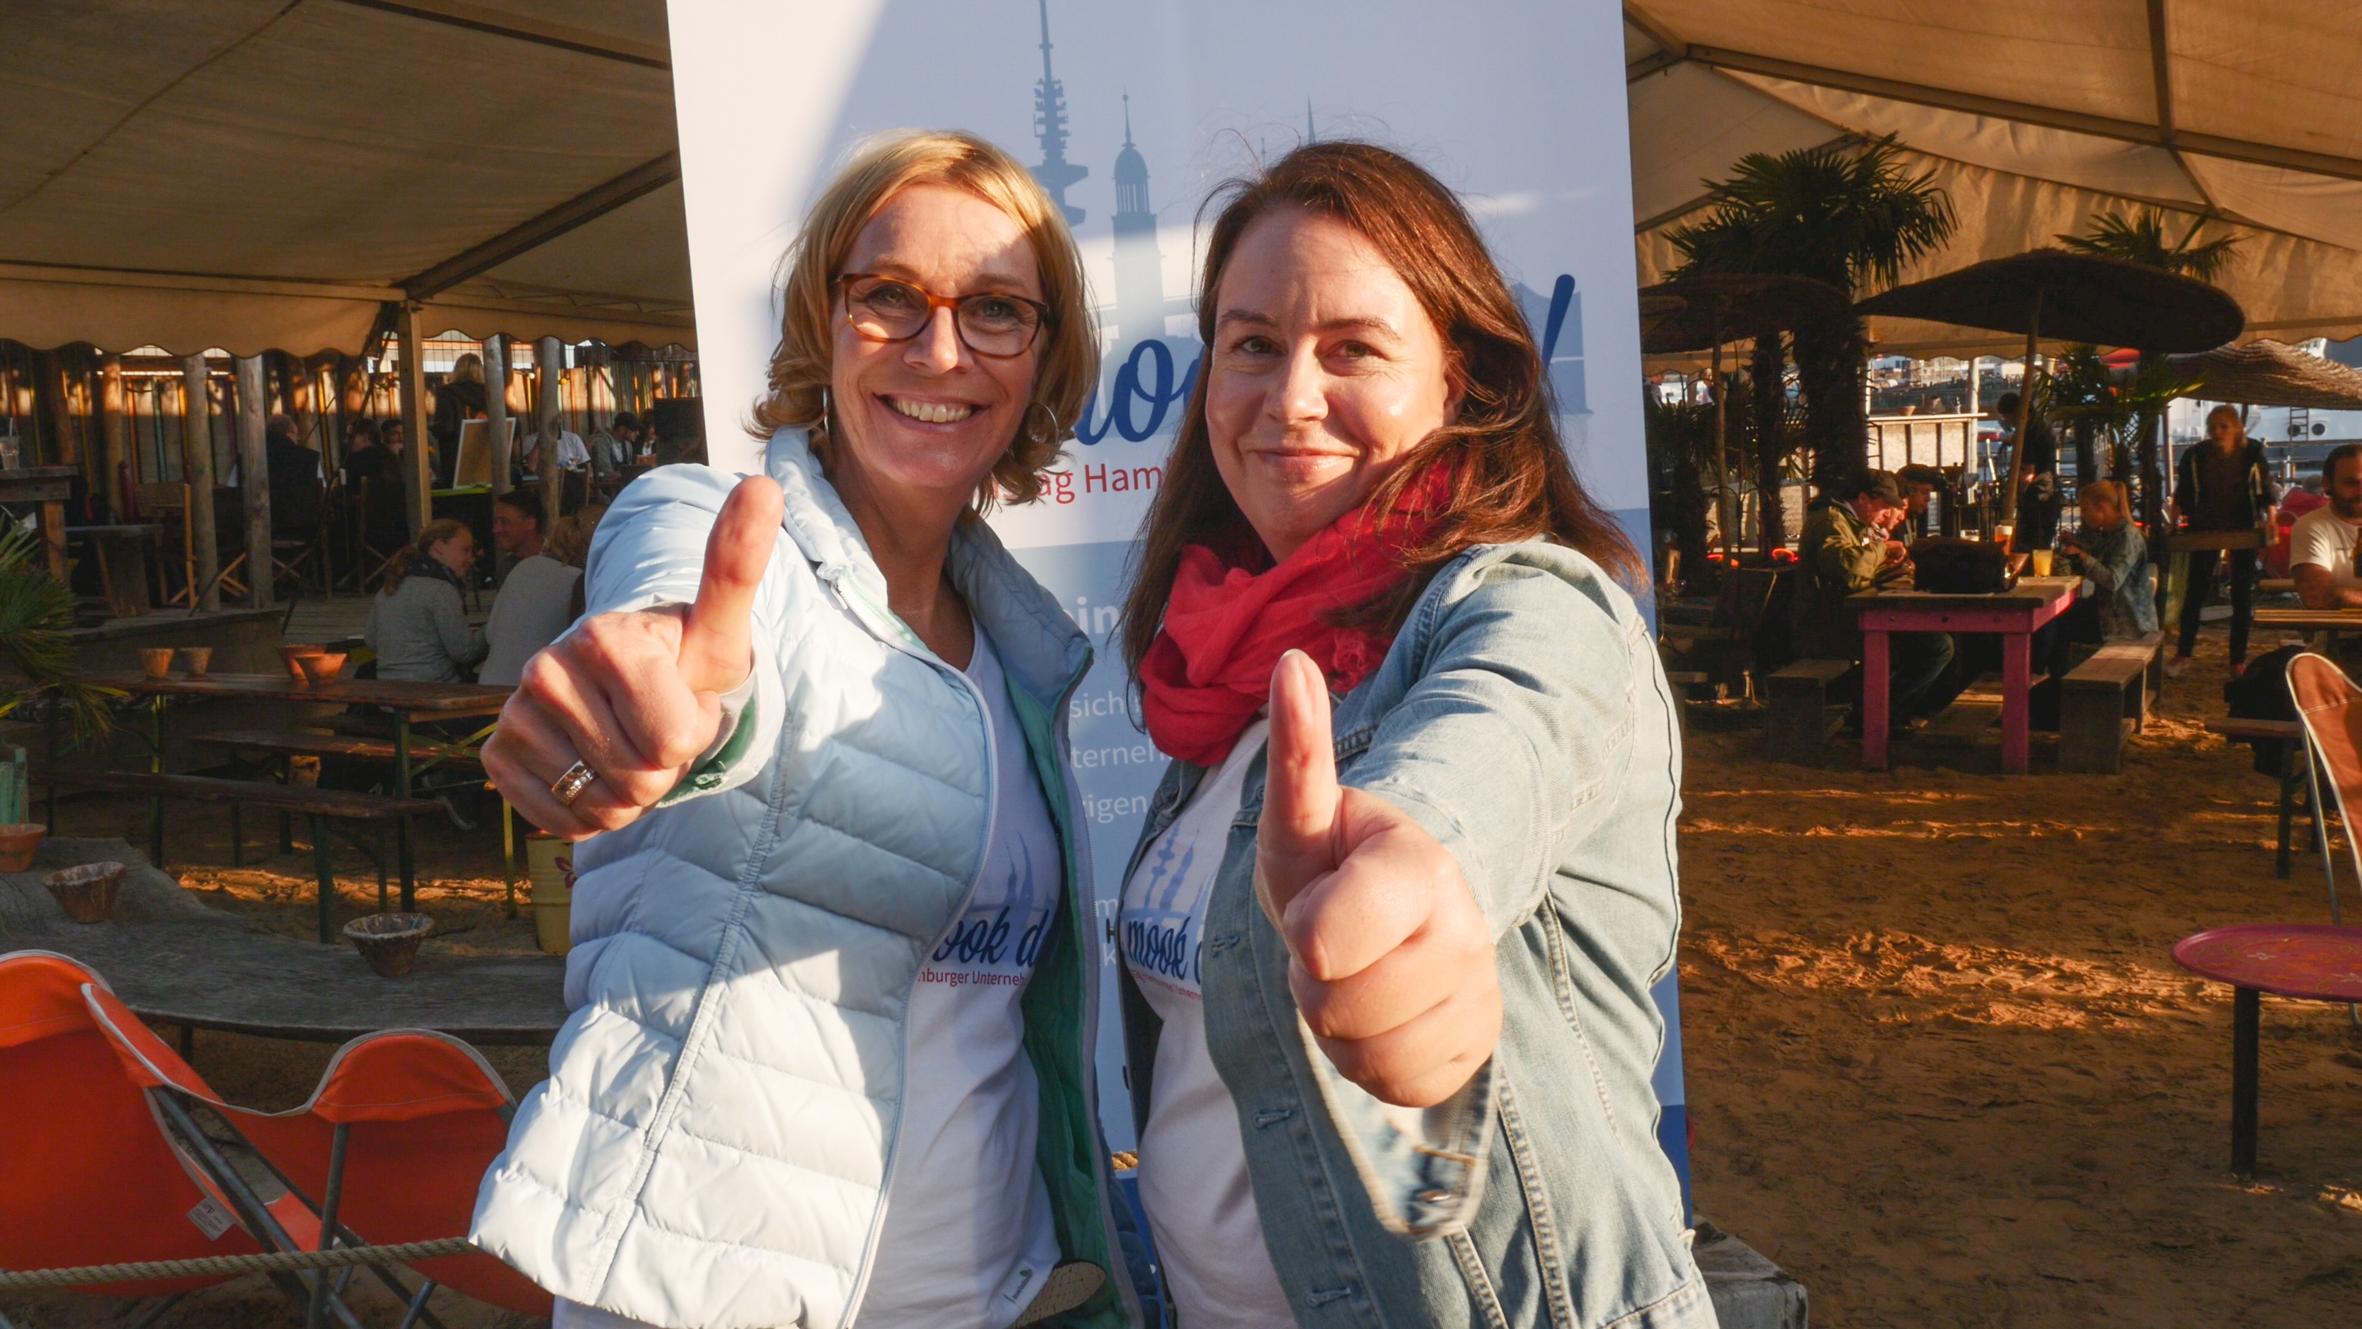 Wi mook dat Initiarorinnen Claudia Seehusen udn Anja Engelke